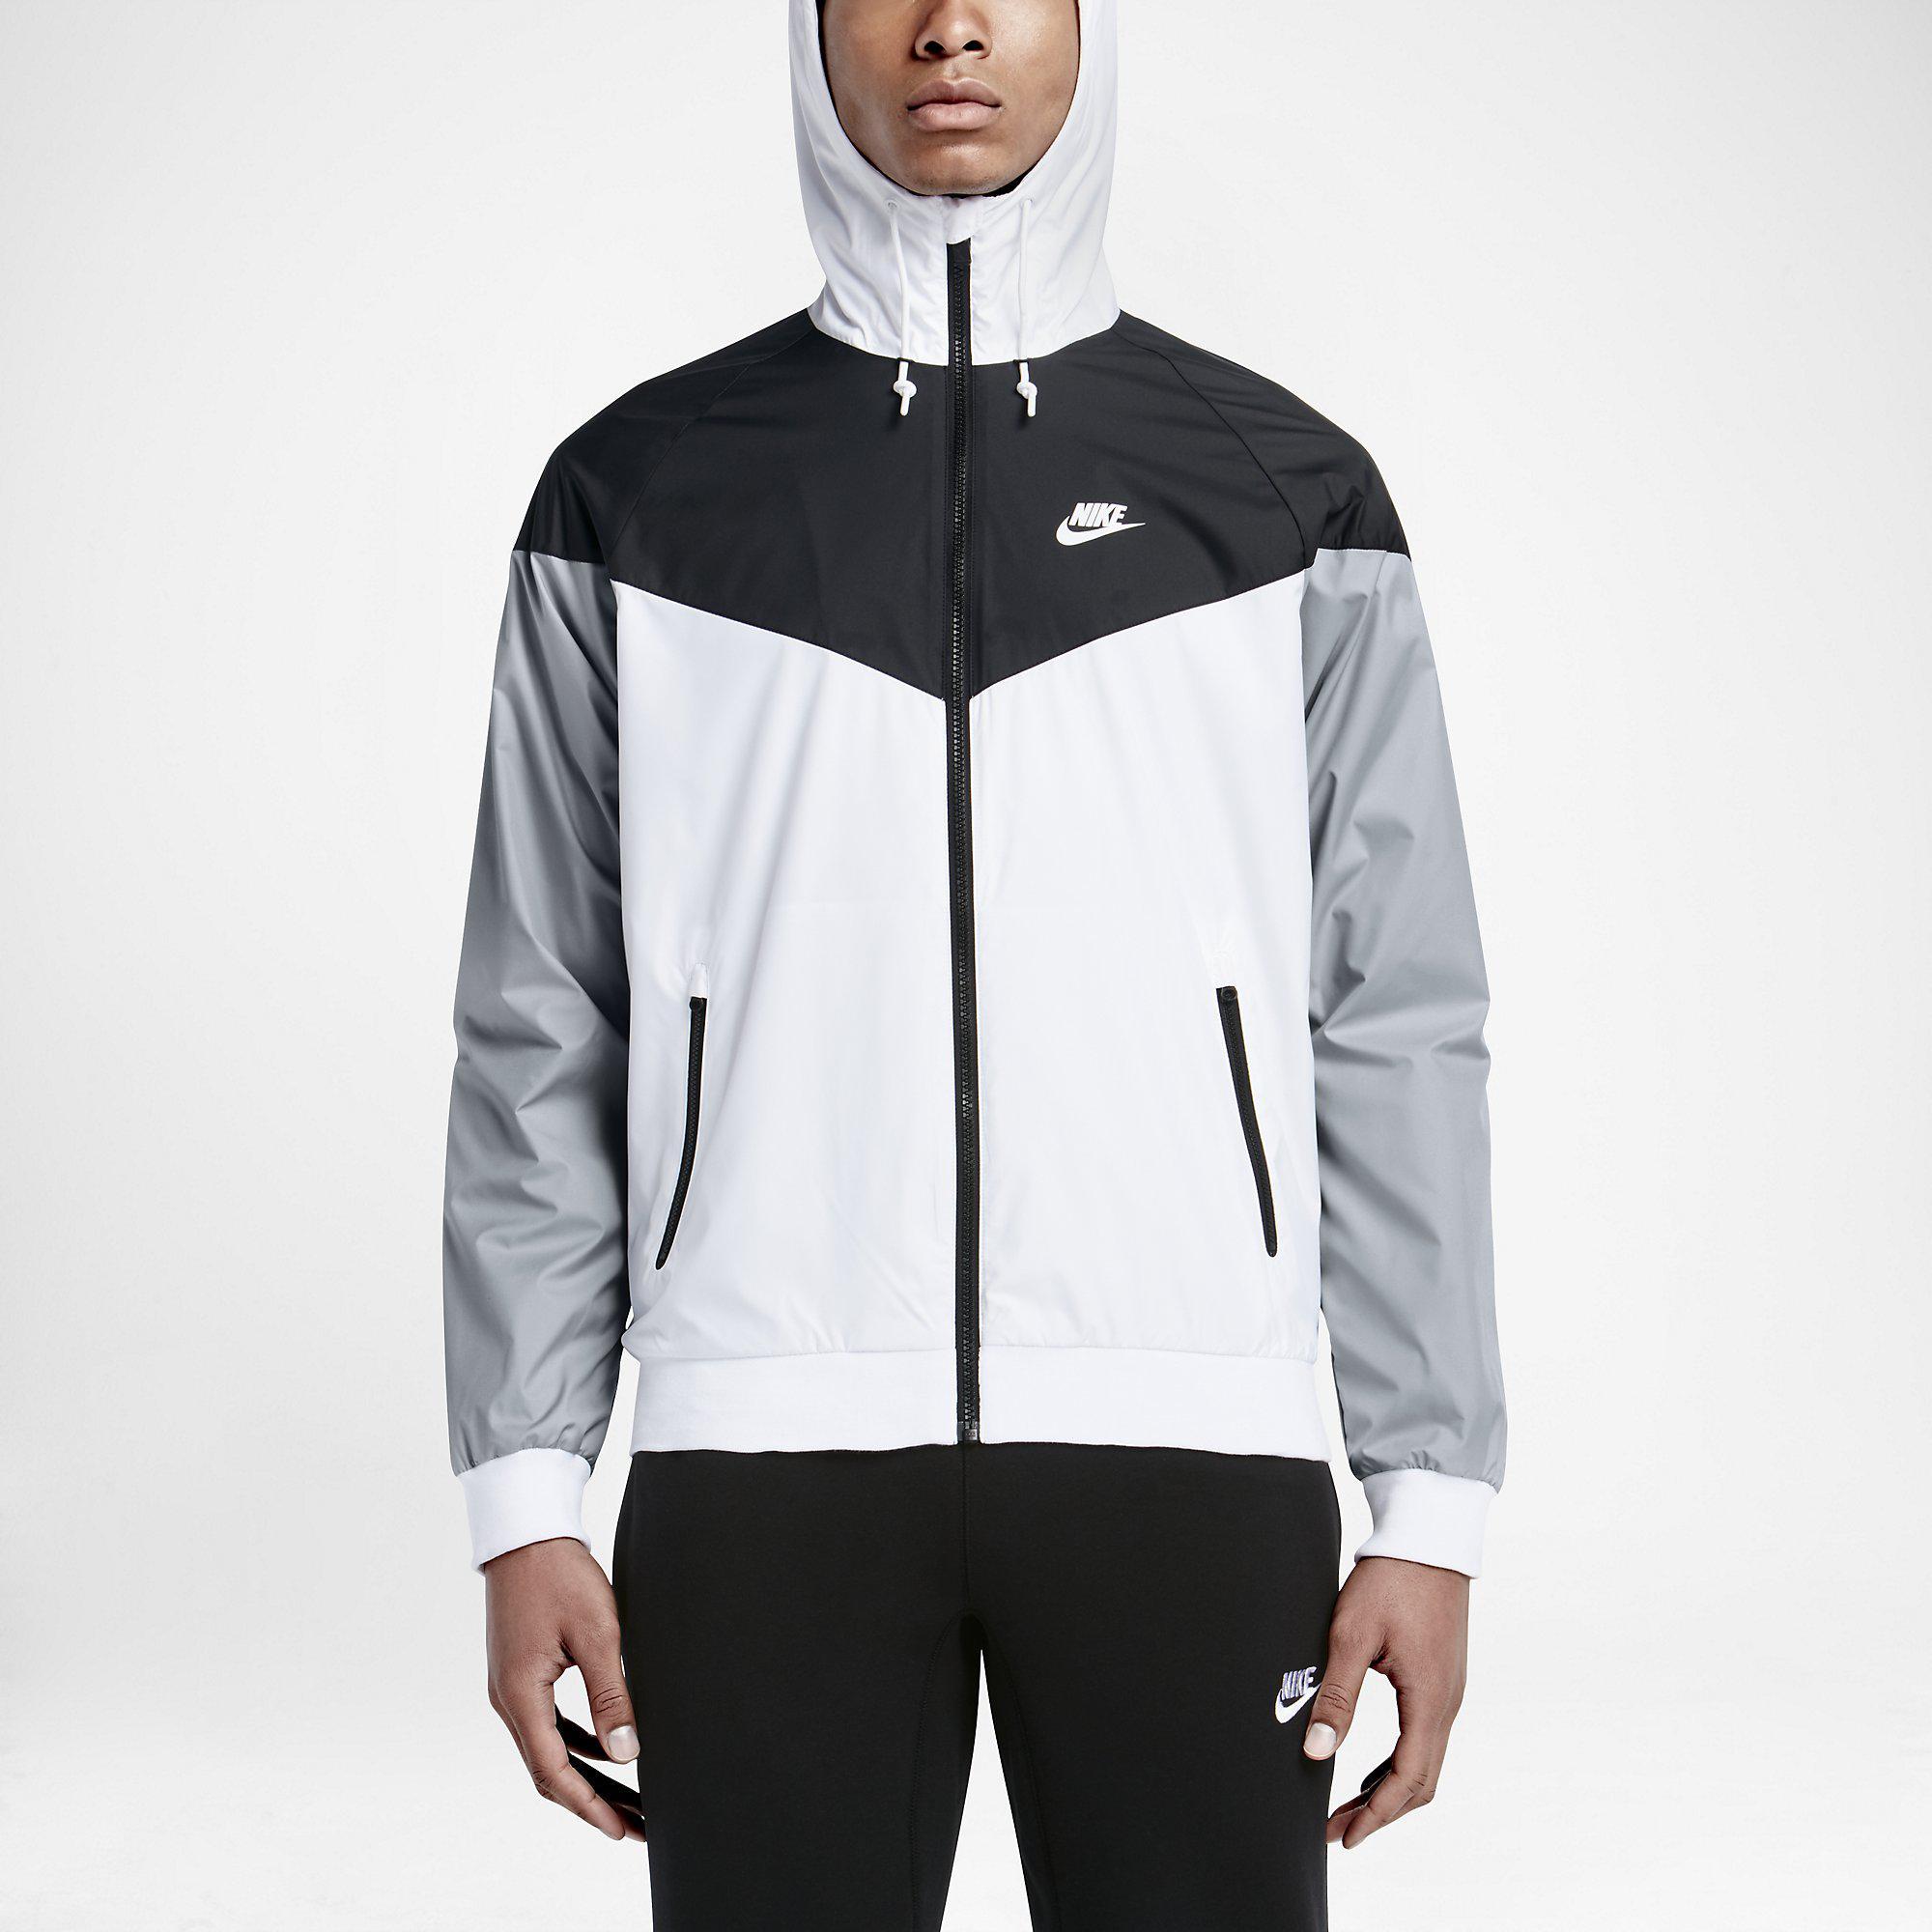 Gray Black White And Gold Bedroom: Nike Mens Sportswear Windrunner Jacket